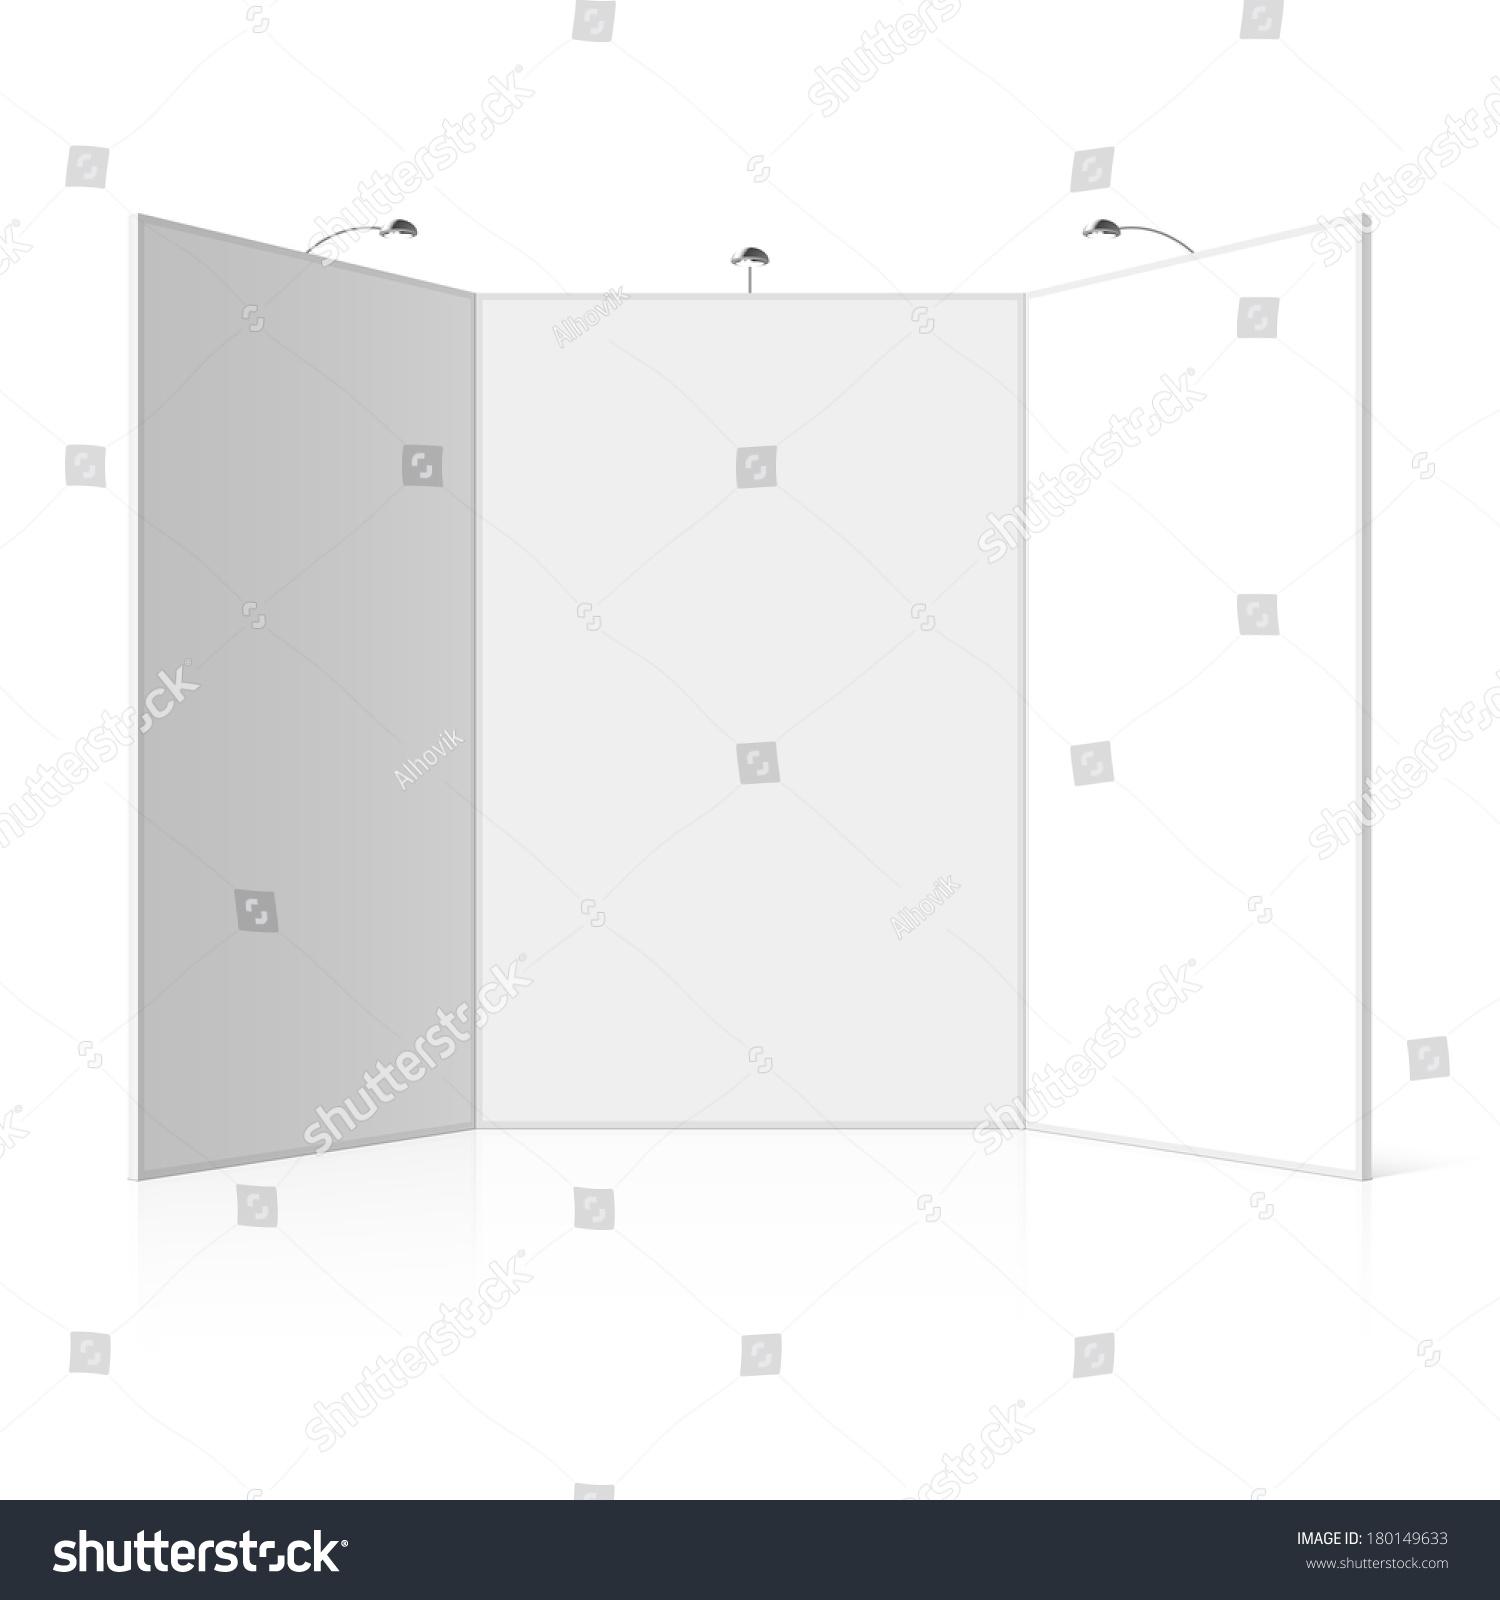 Modular Exhibition Stand Vector : Portable folding presentation display board three stock